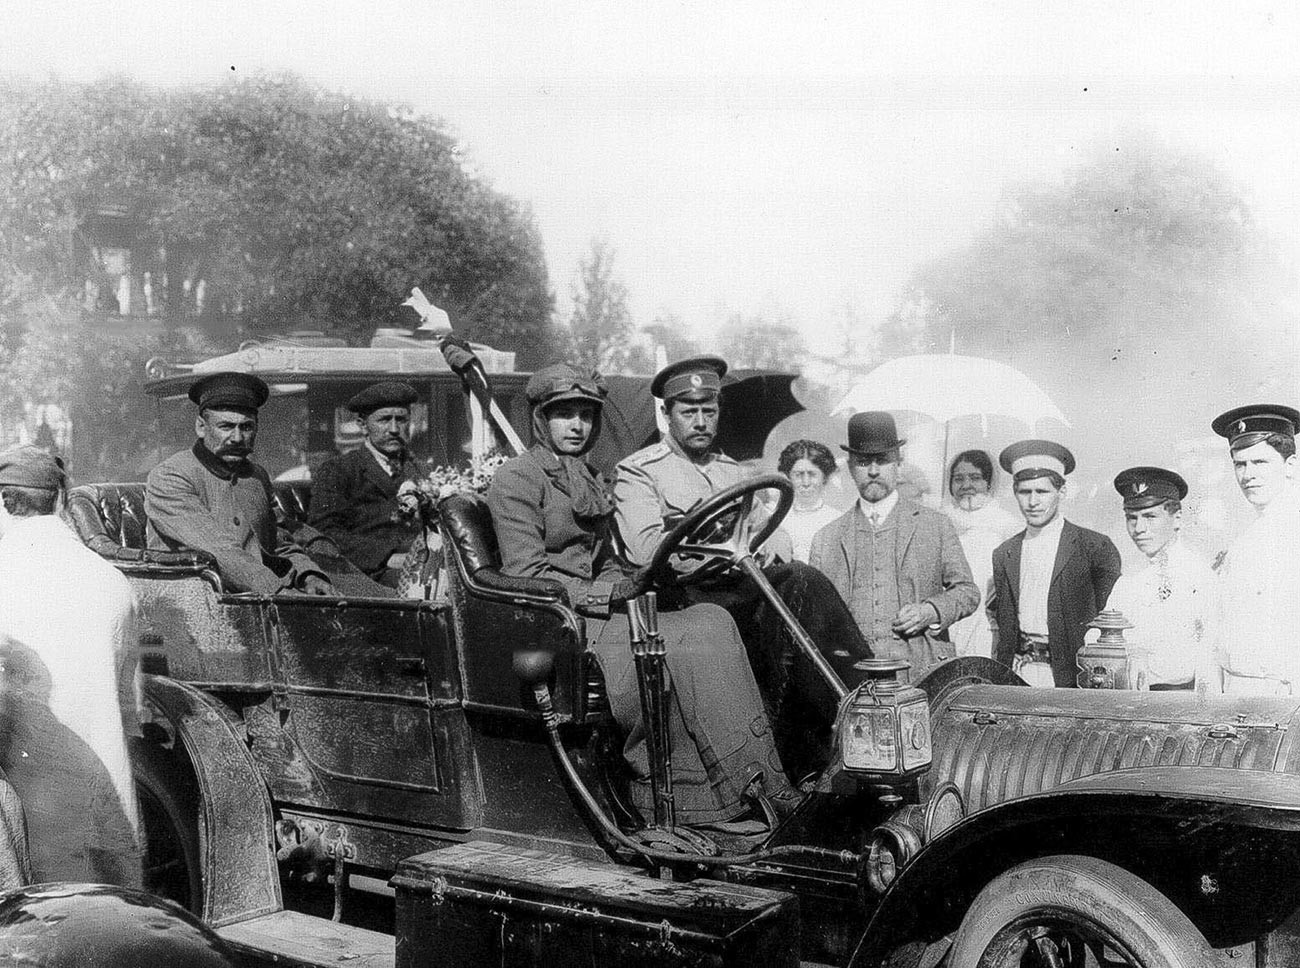 Sophia Dolgoroukova pendant la course impériale de 1910